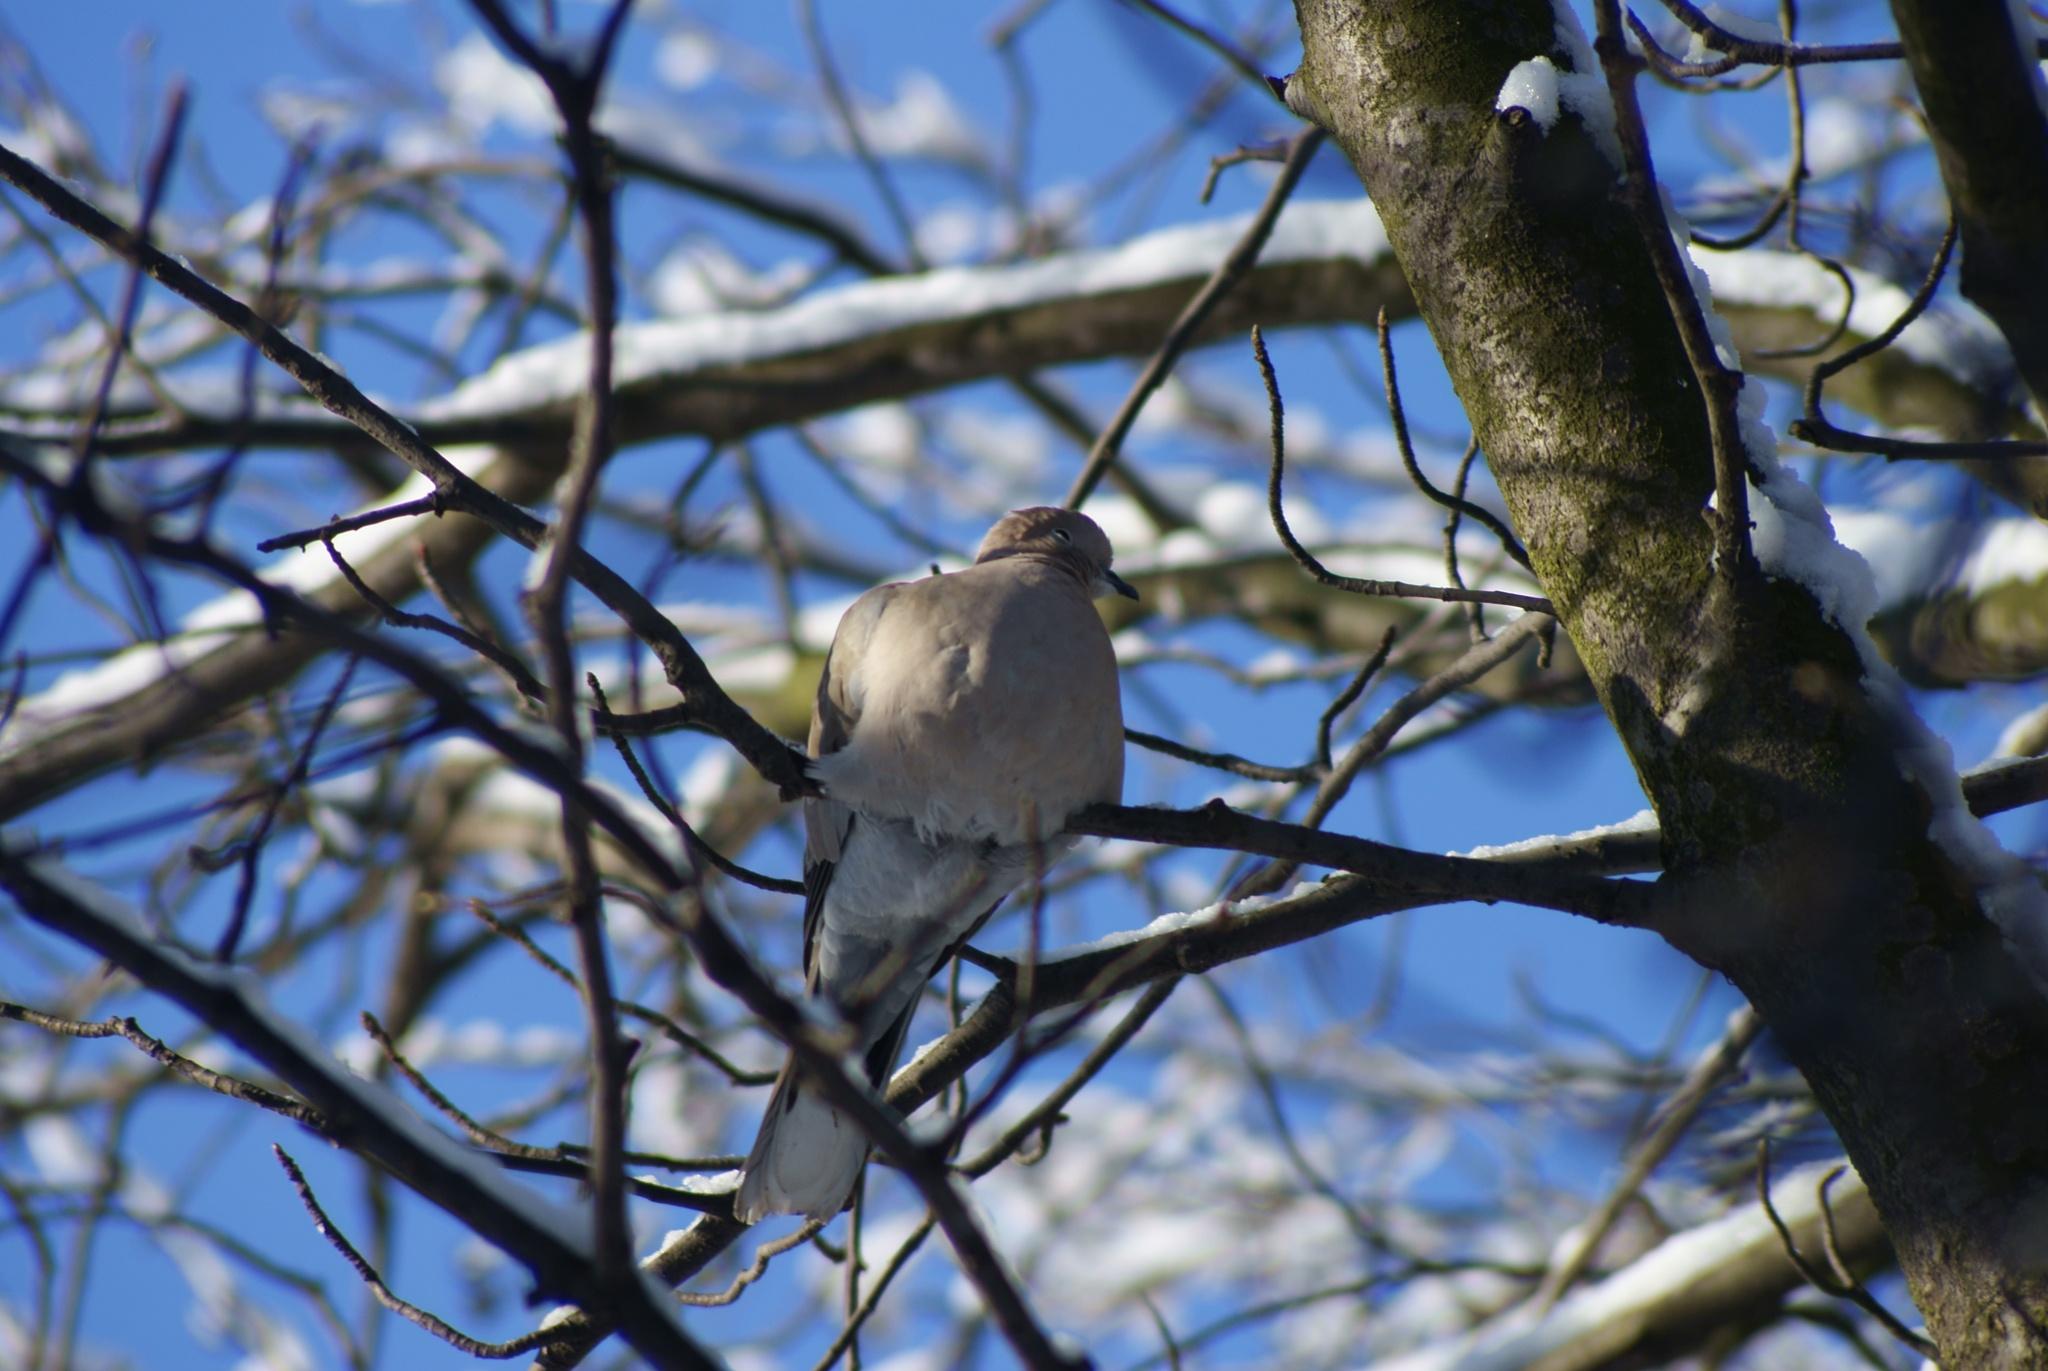 pigeon by mironik202